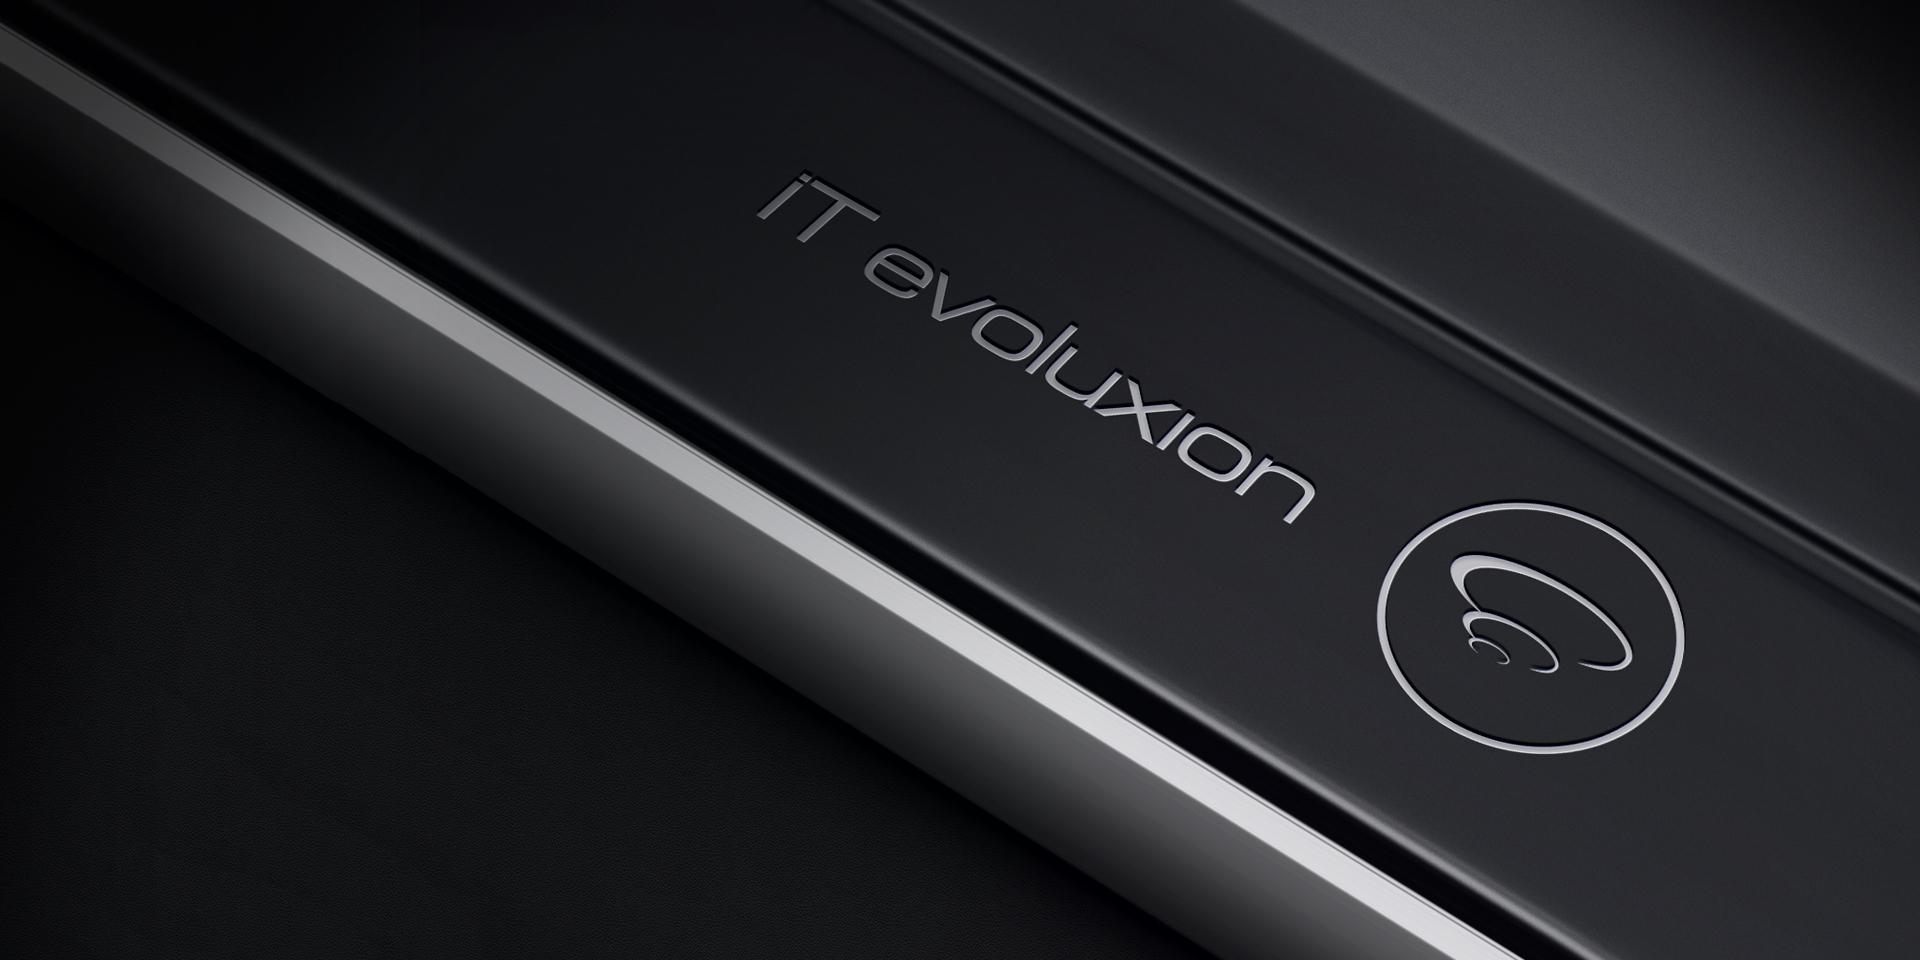 iT evoluxion